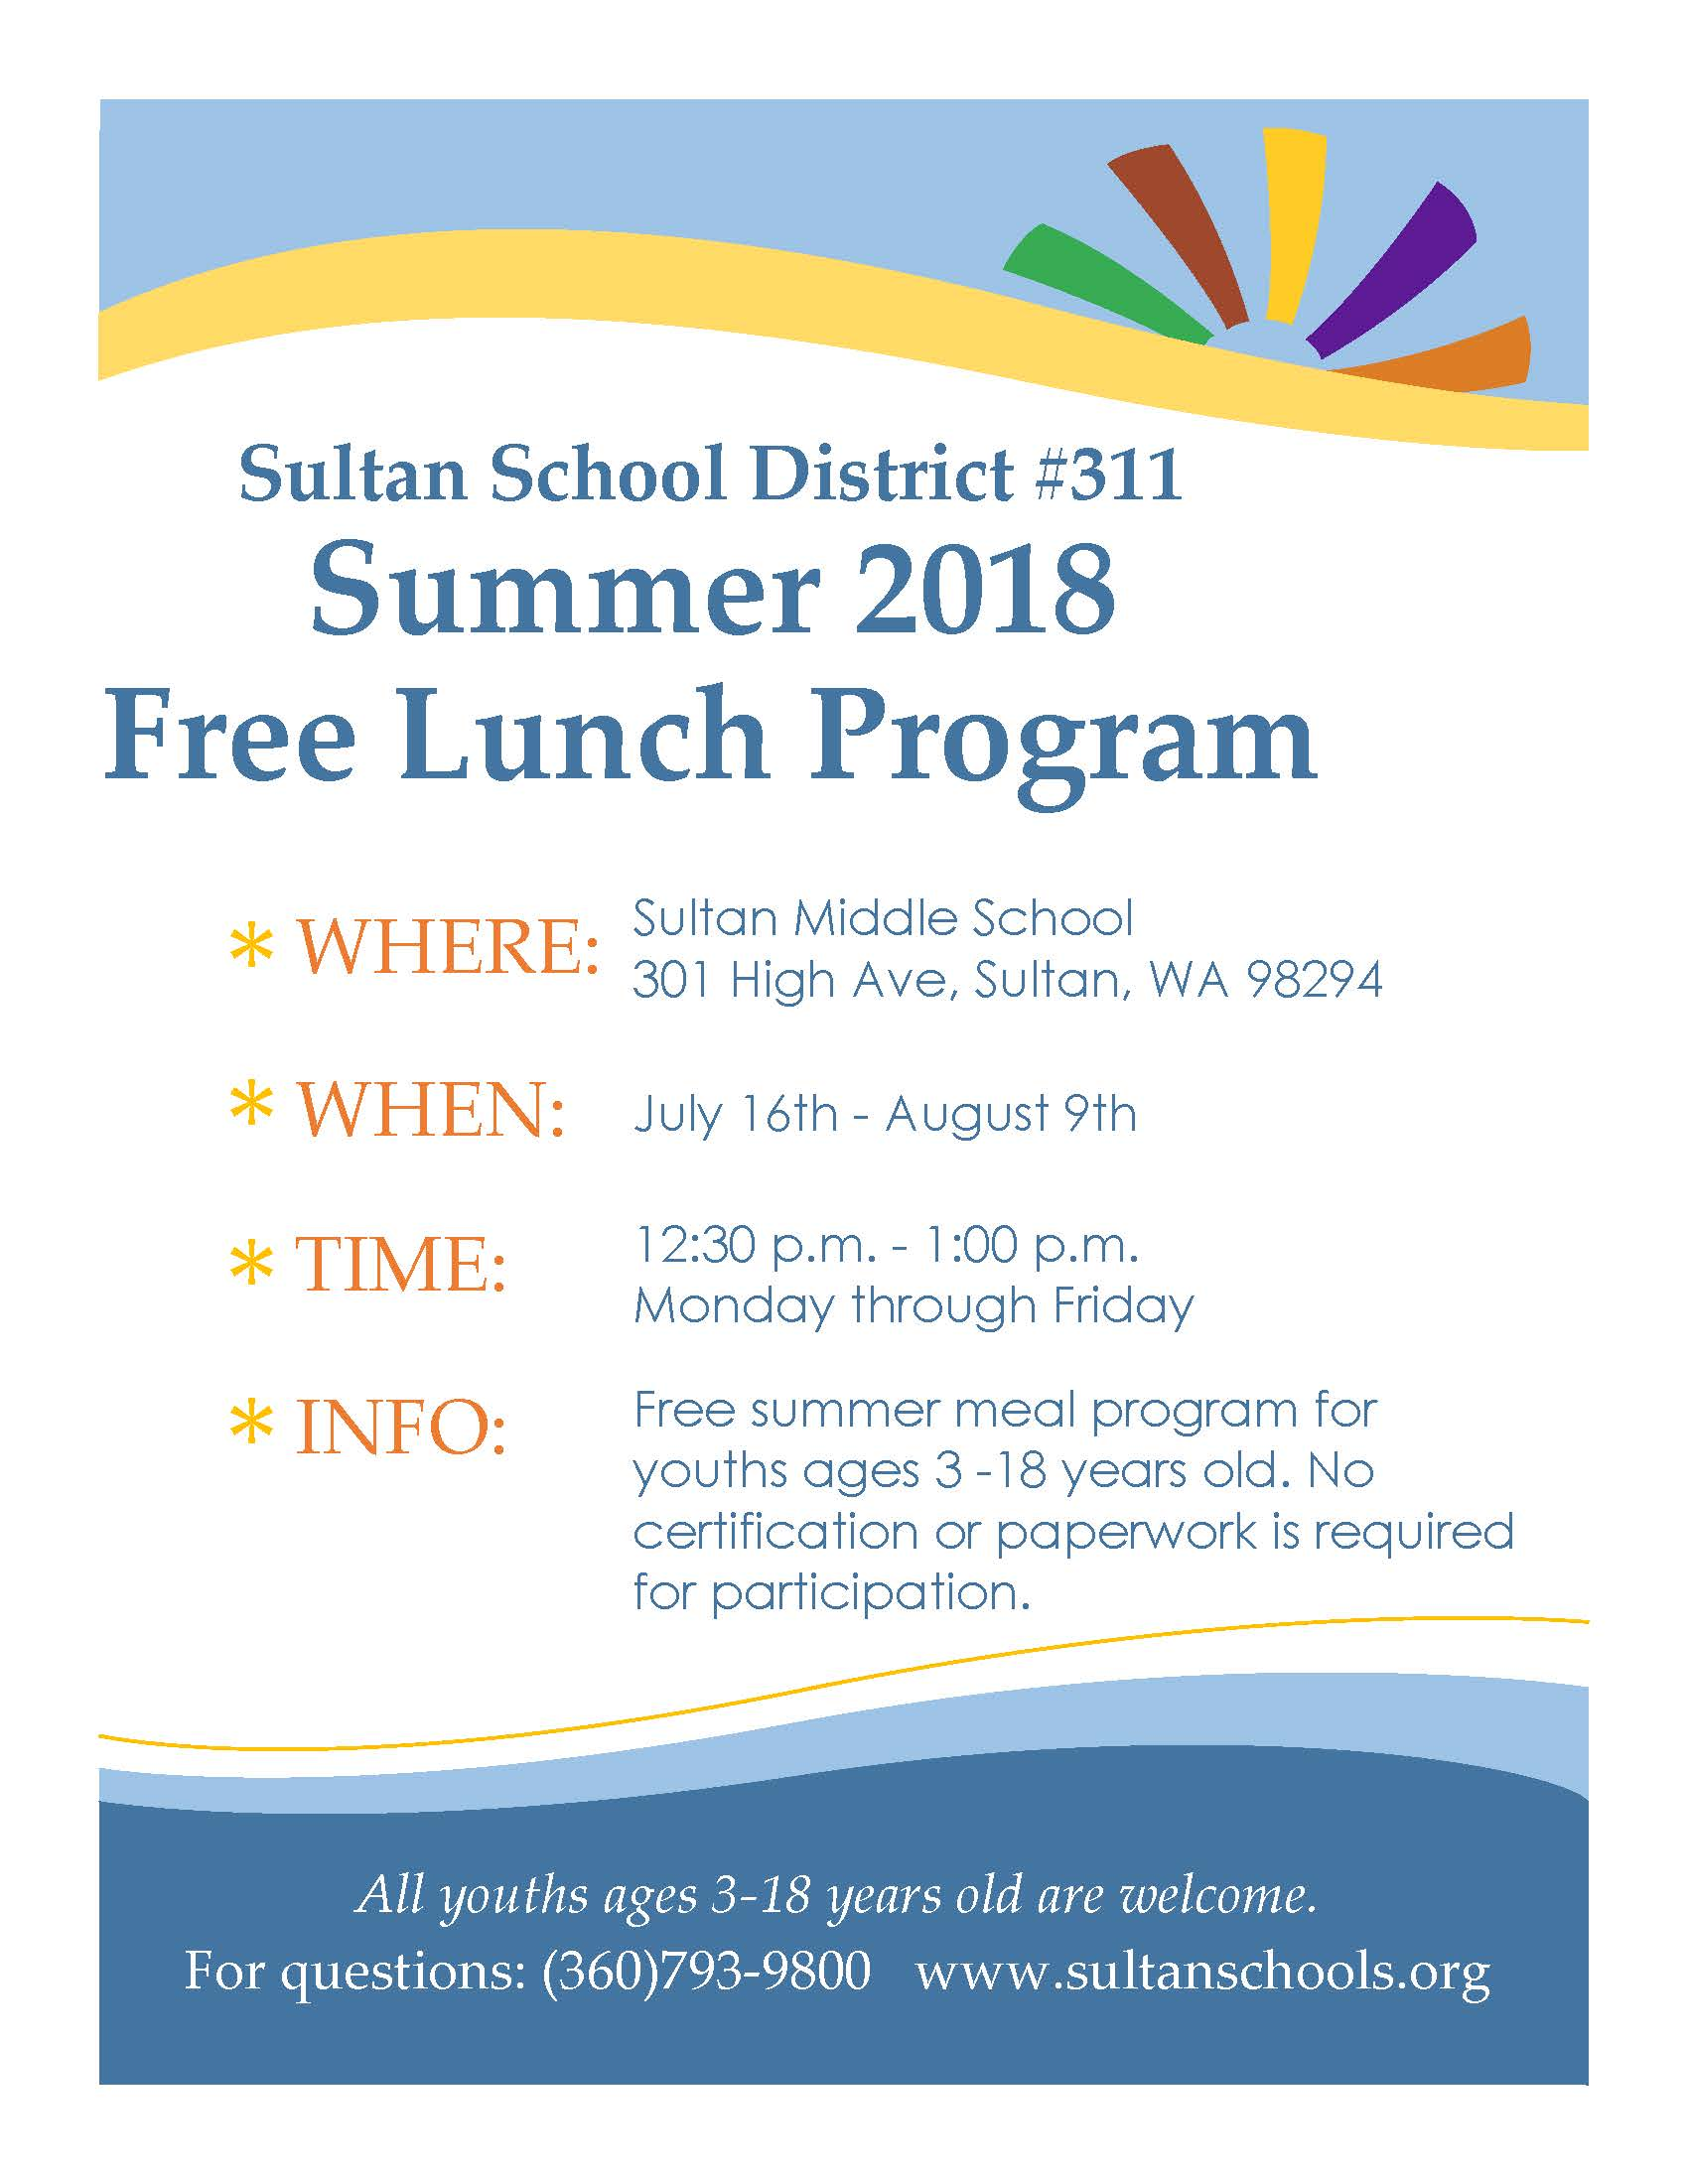 summer 2018 free lunch program sultan school city united states